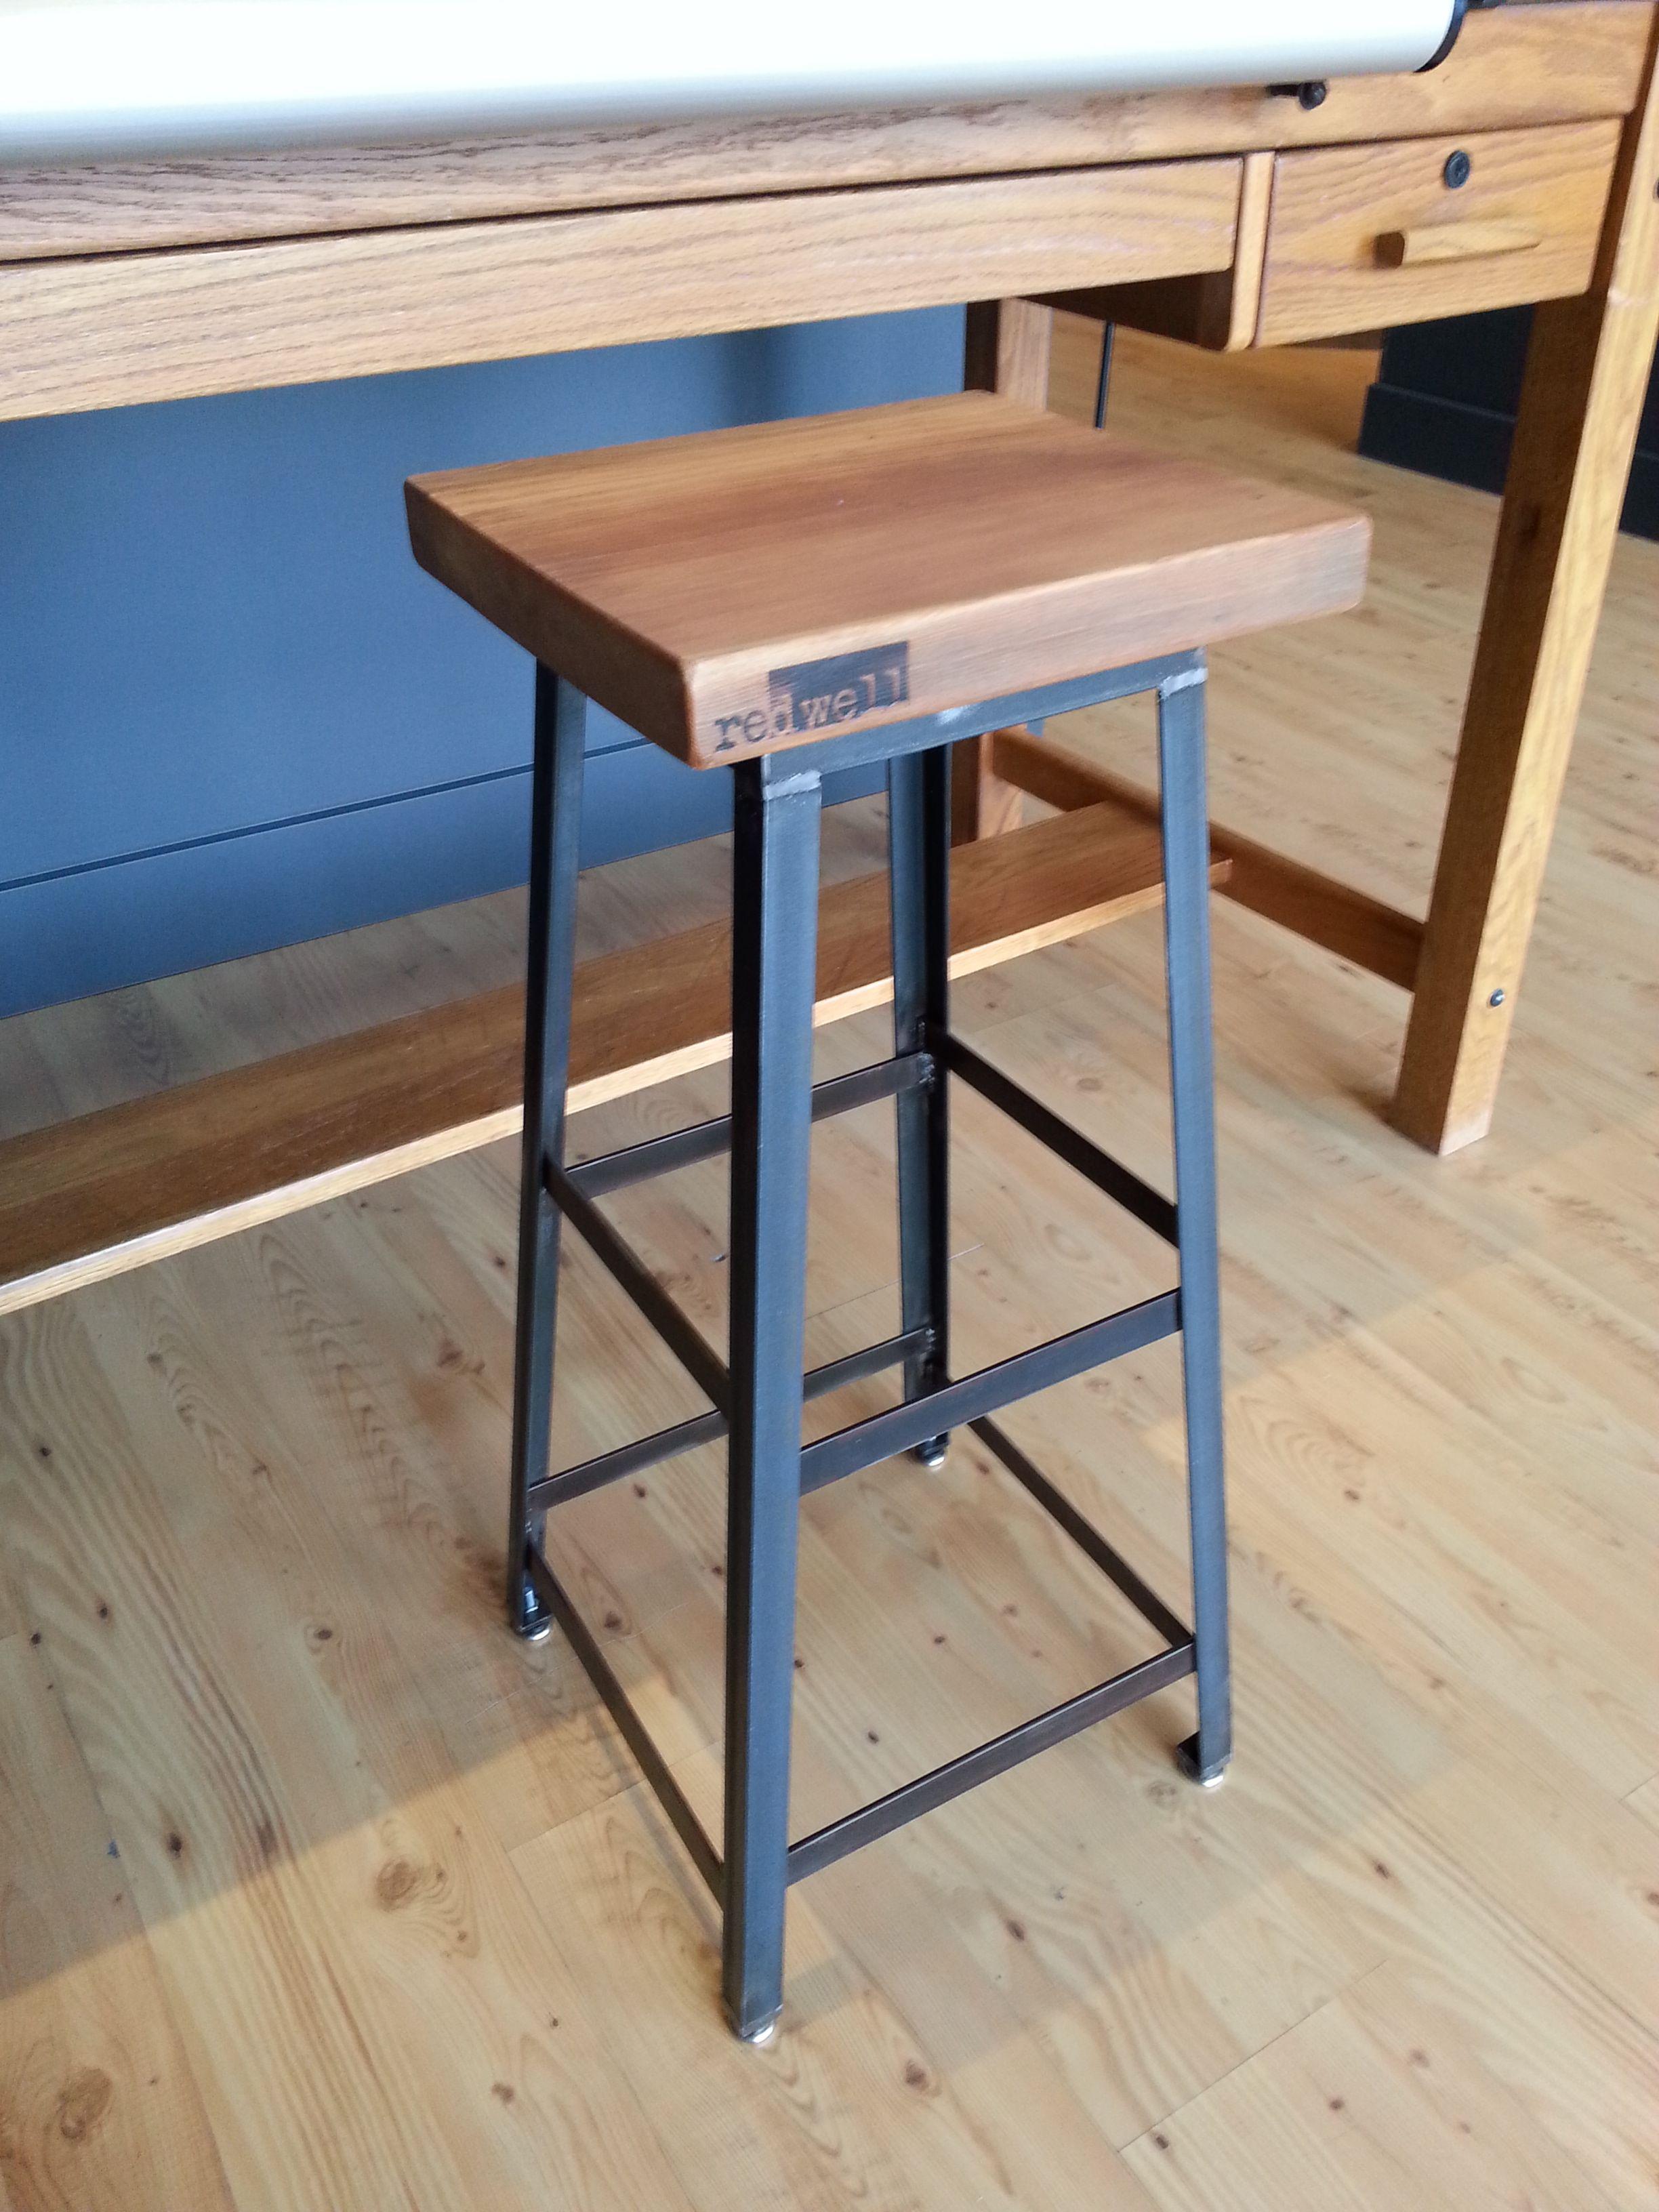 Tremendous Re Dwell Industrial Stool Customarchery Wood Chair Design Ideas Customarcherynet